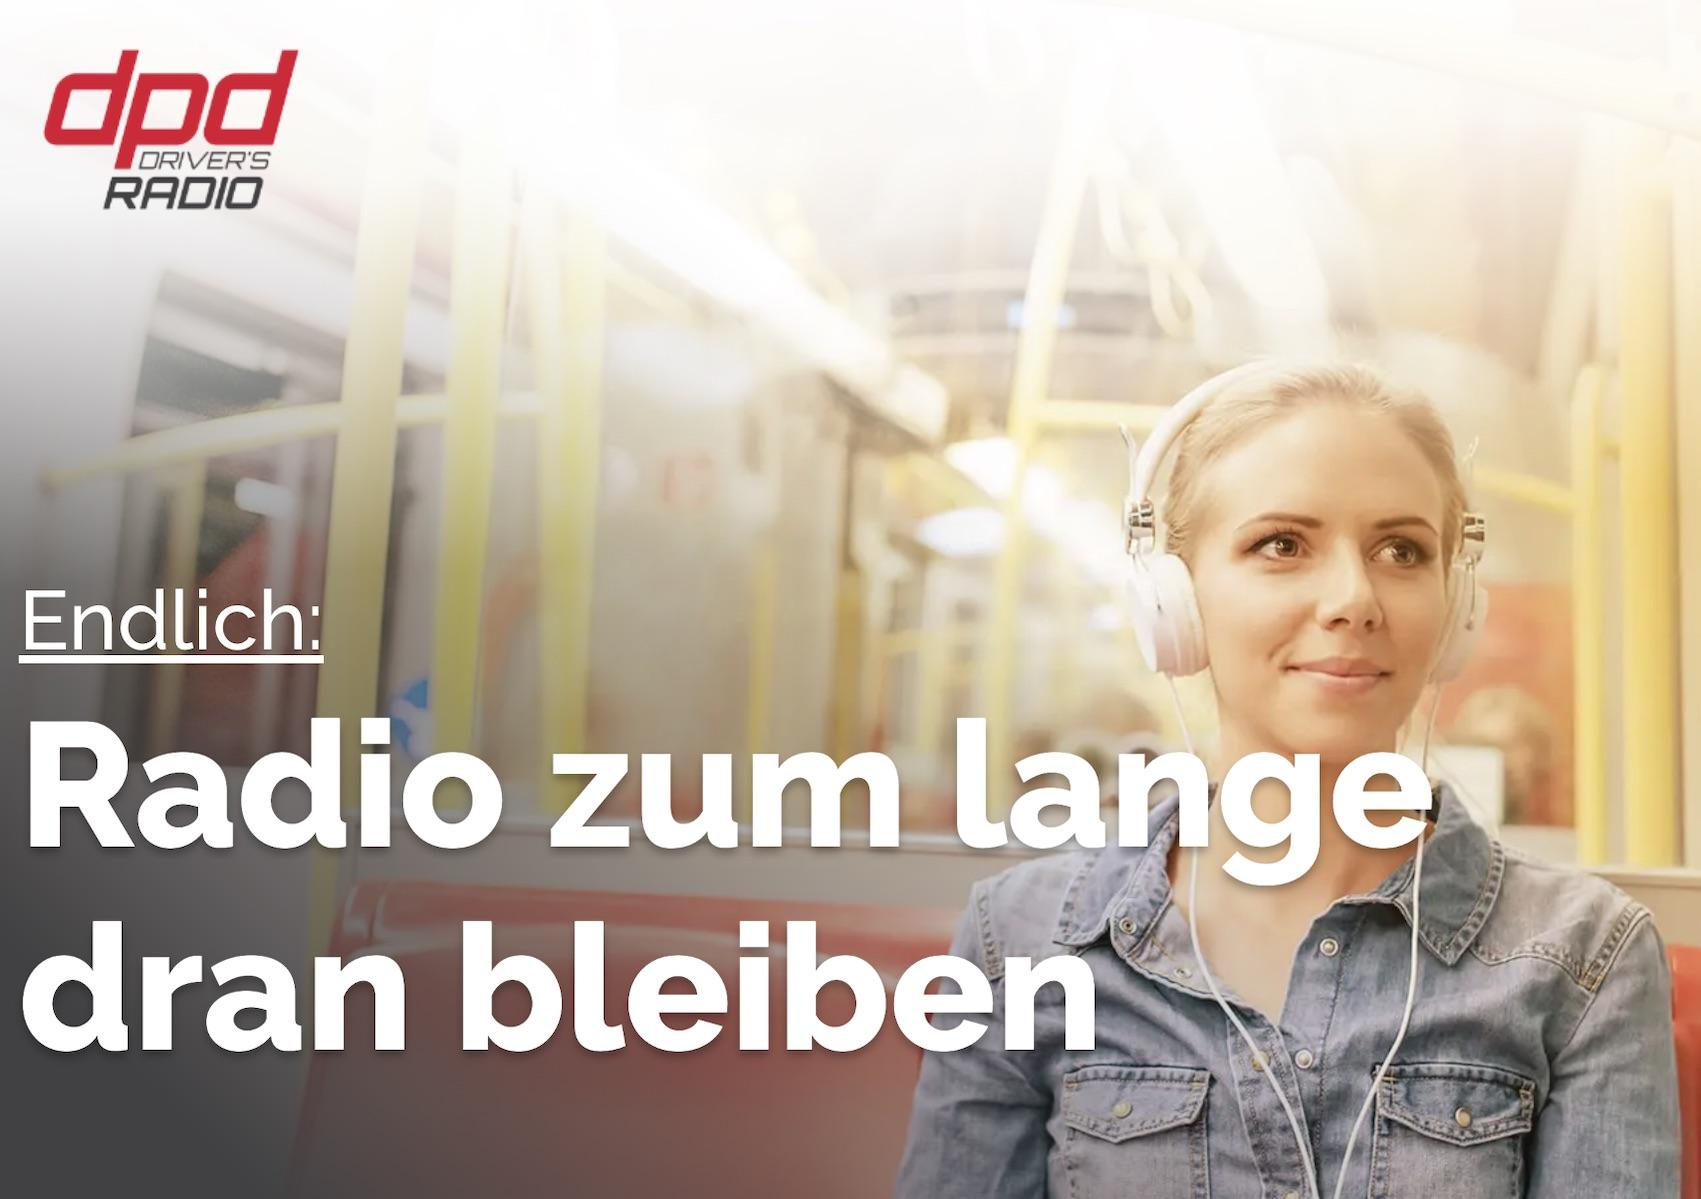 dpd Driver's Radio startet (Quelle: dpd-driversradio.de, Screenshot: SmartPhoneFan.de)